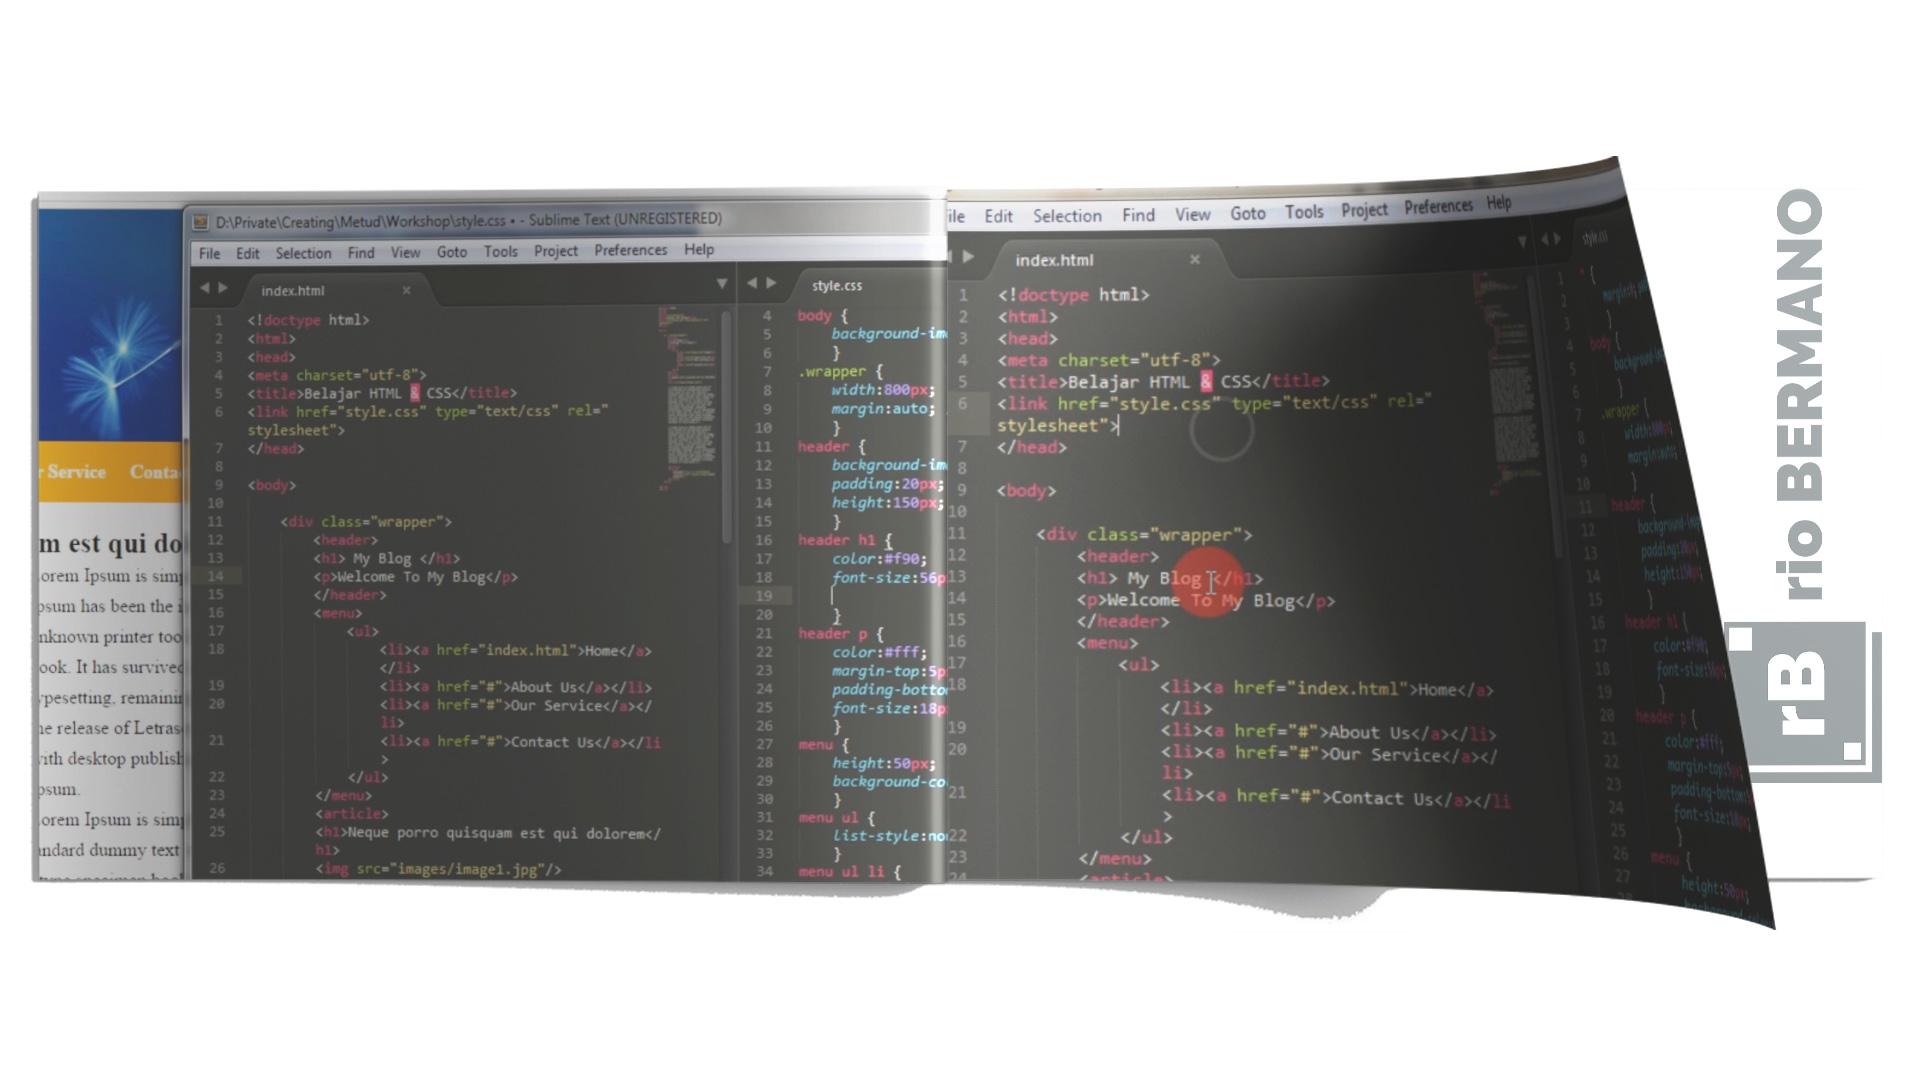 cara membuat bayangan pada text html css - rio bermano